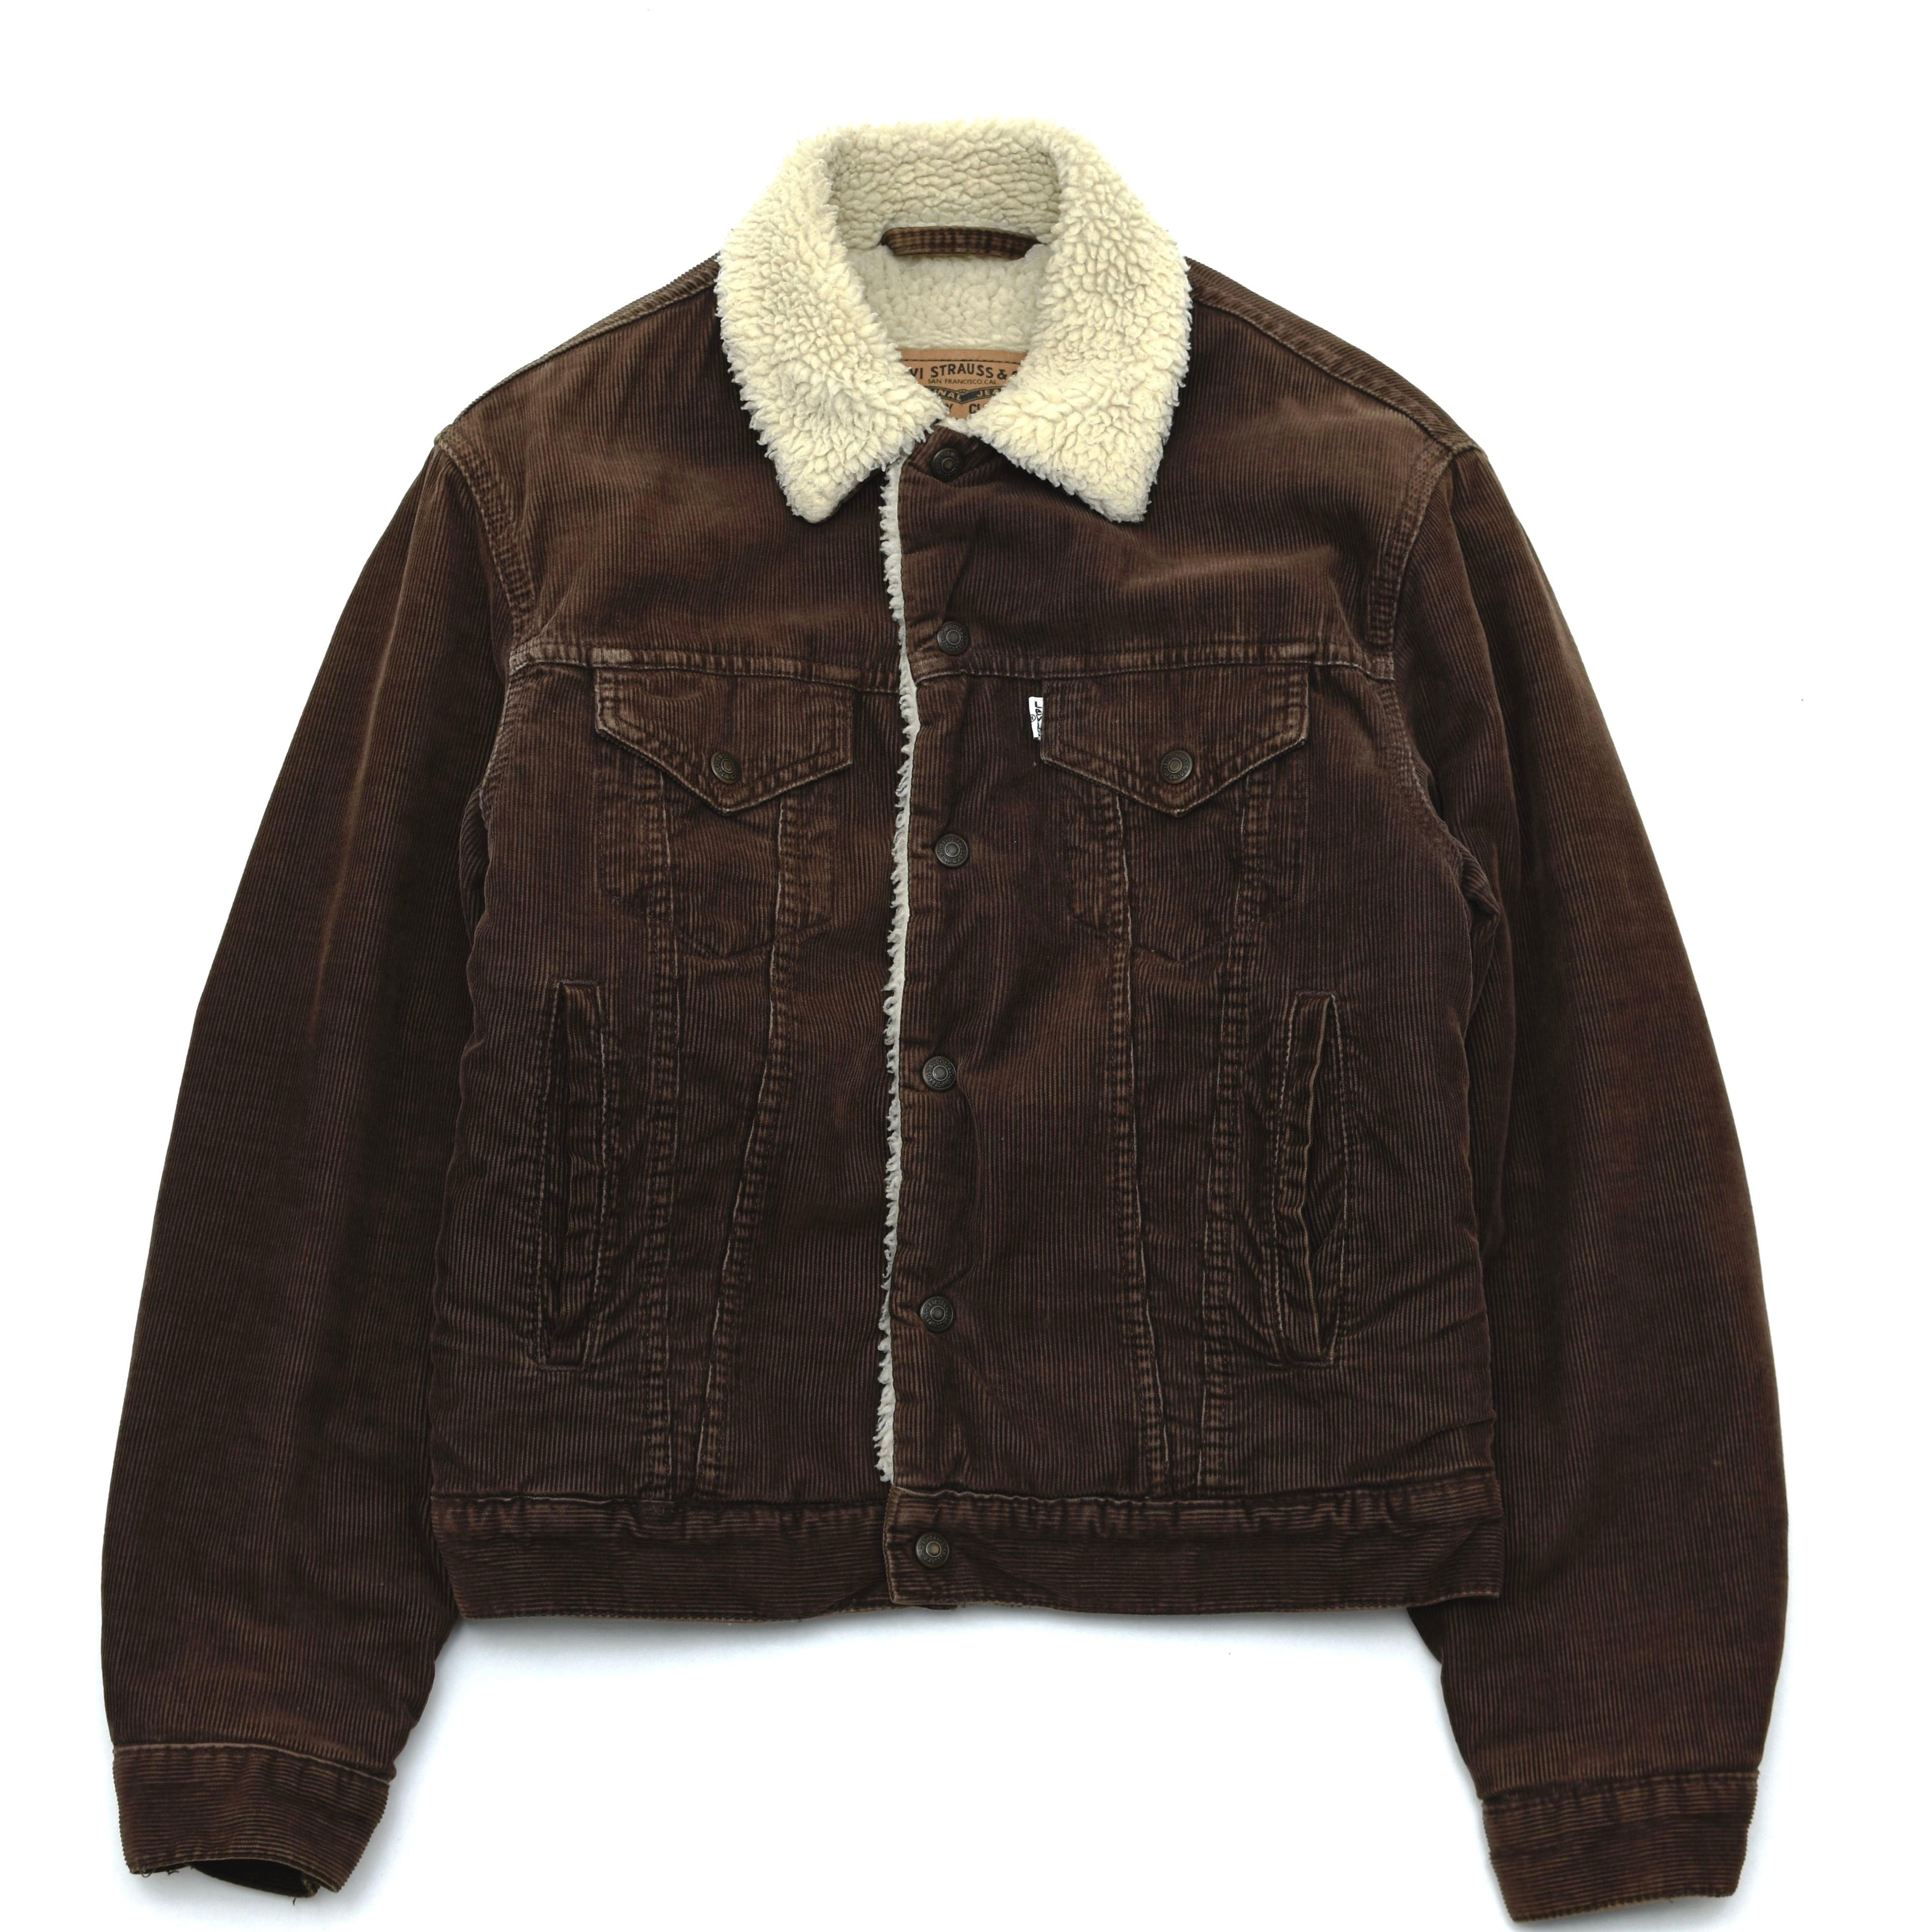 90's Levi's 71500 corduroy boa jacket